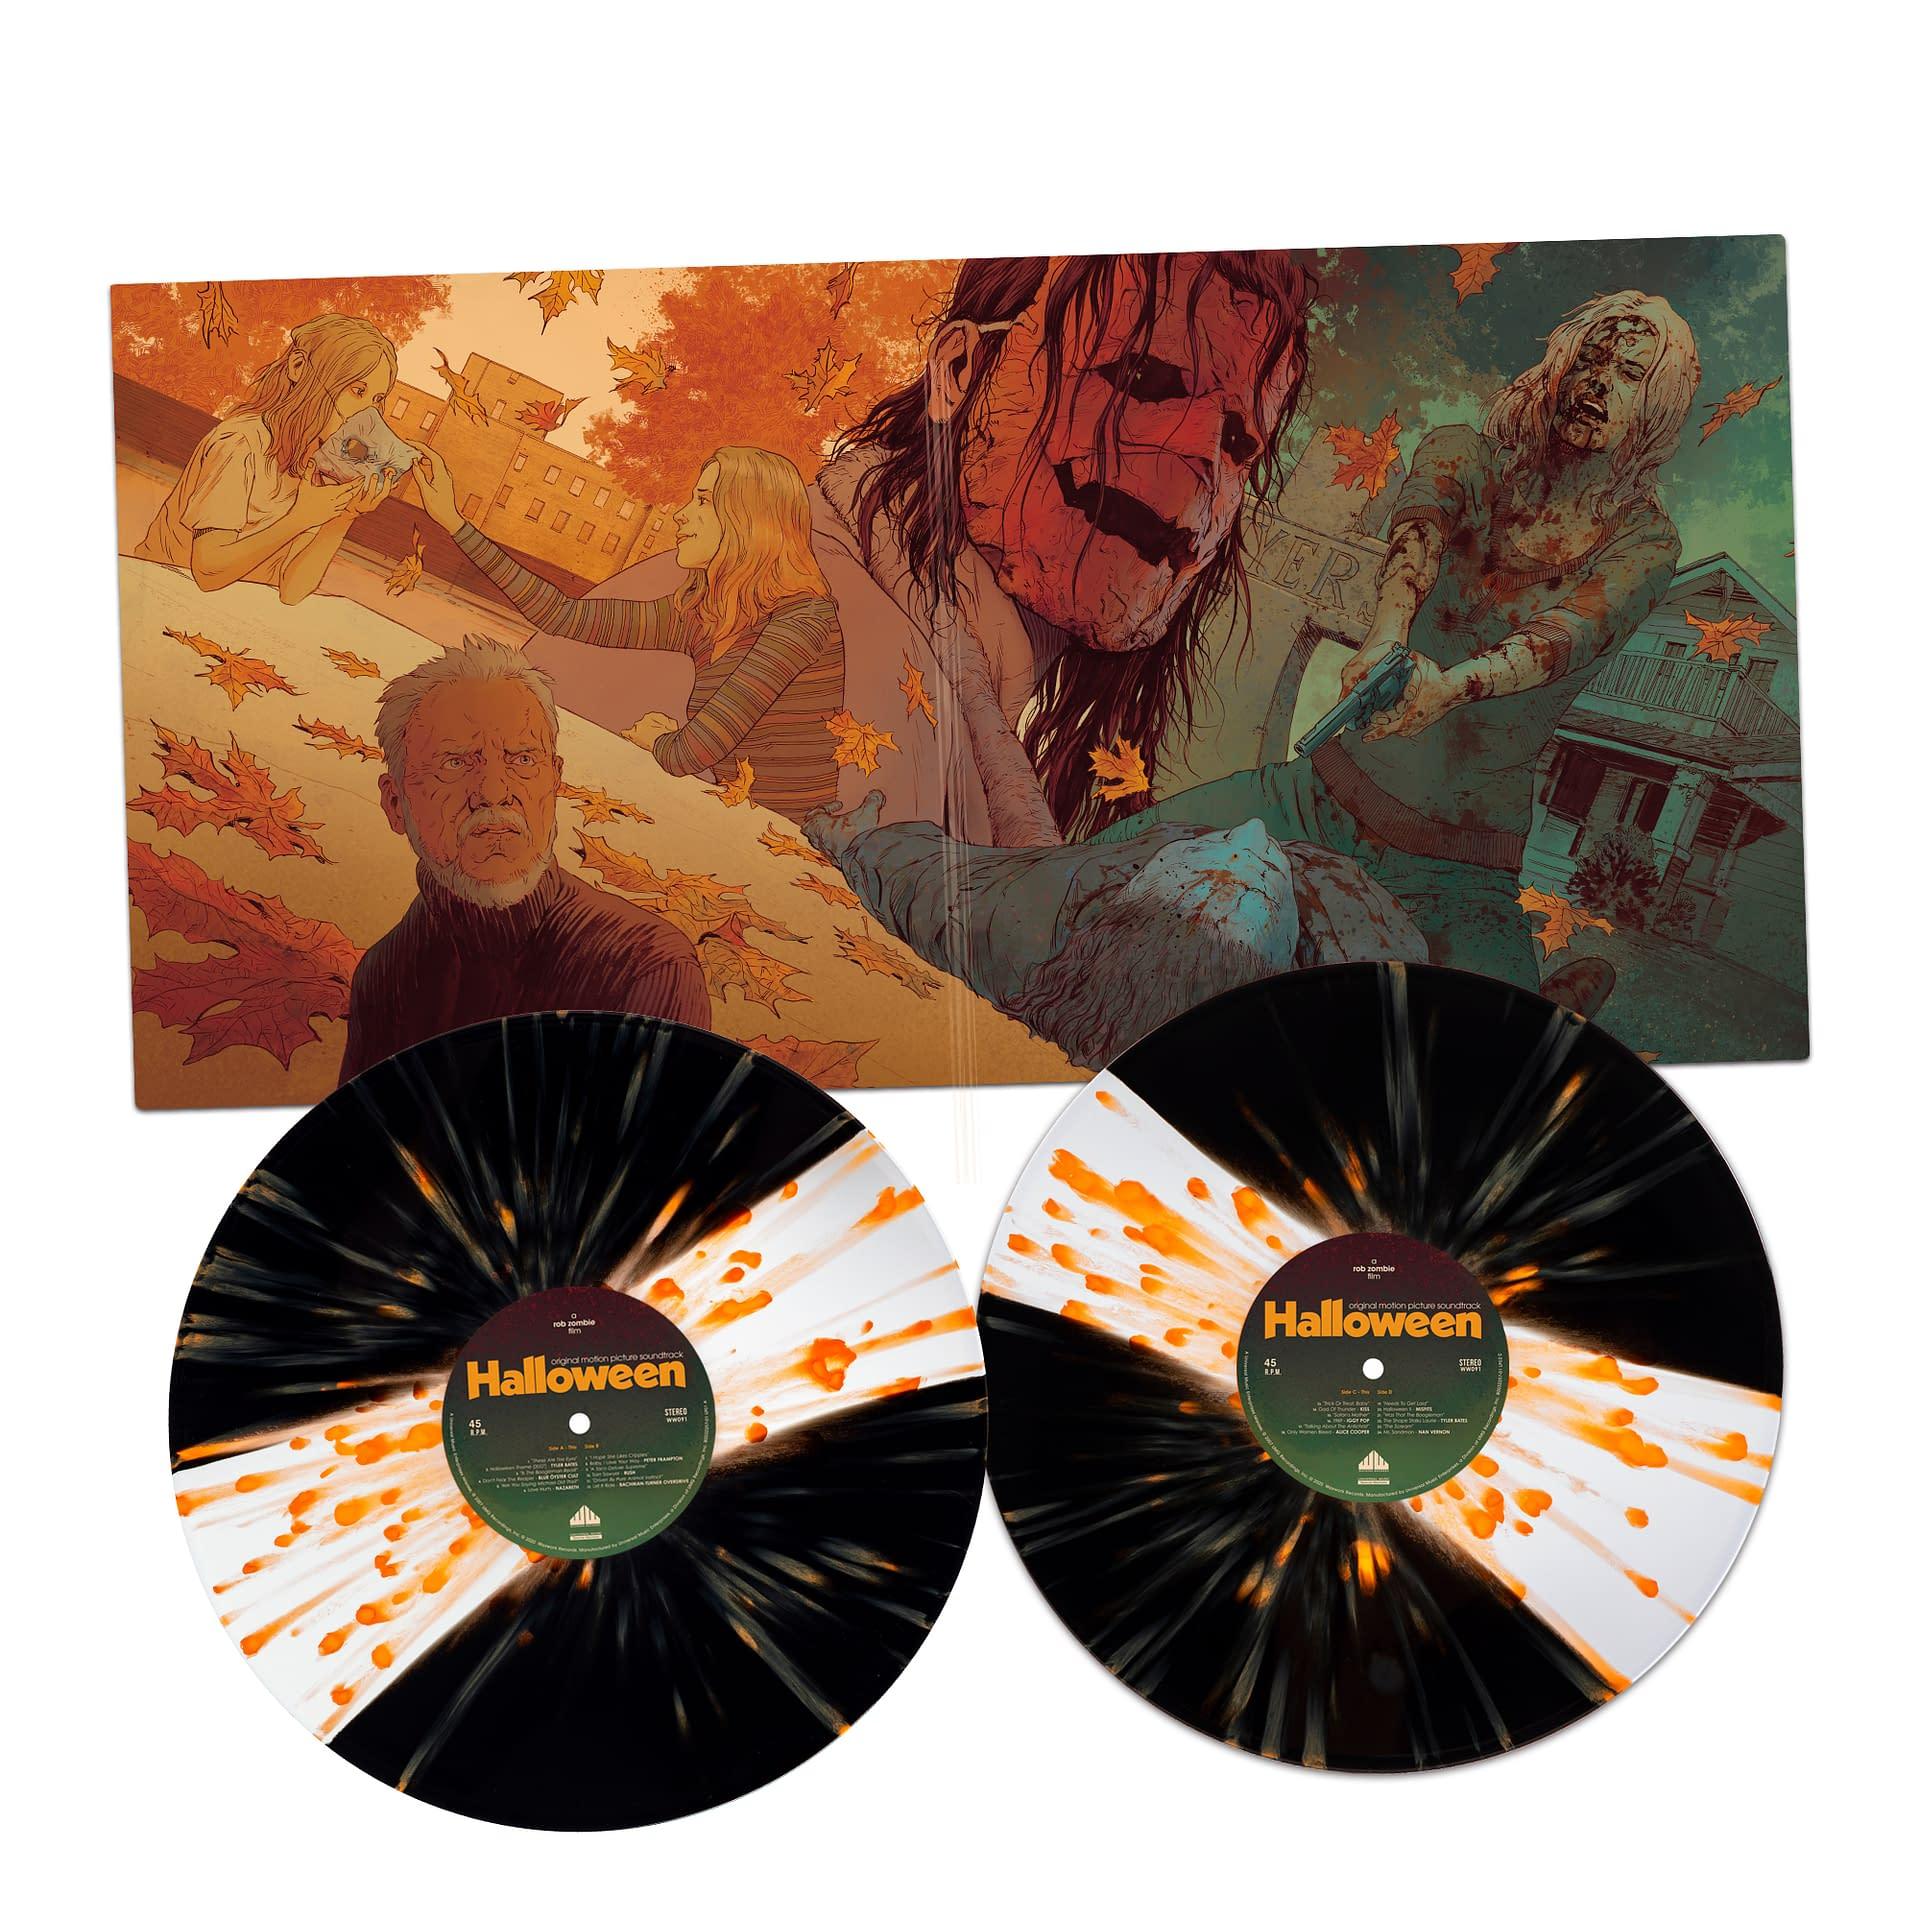 Waxwork Records Releasing Rob Zombie's Halloween 1&2 Soundtracks